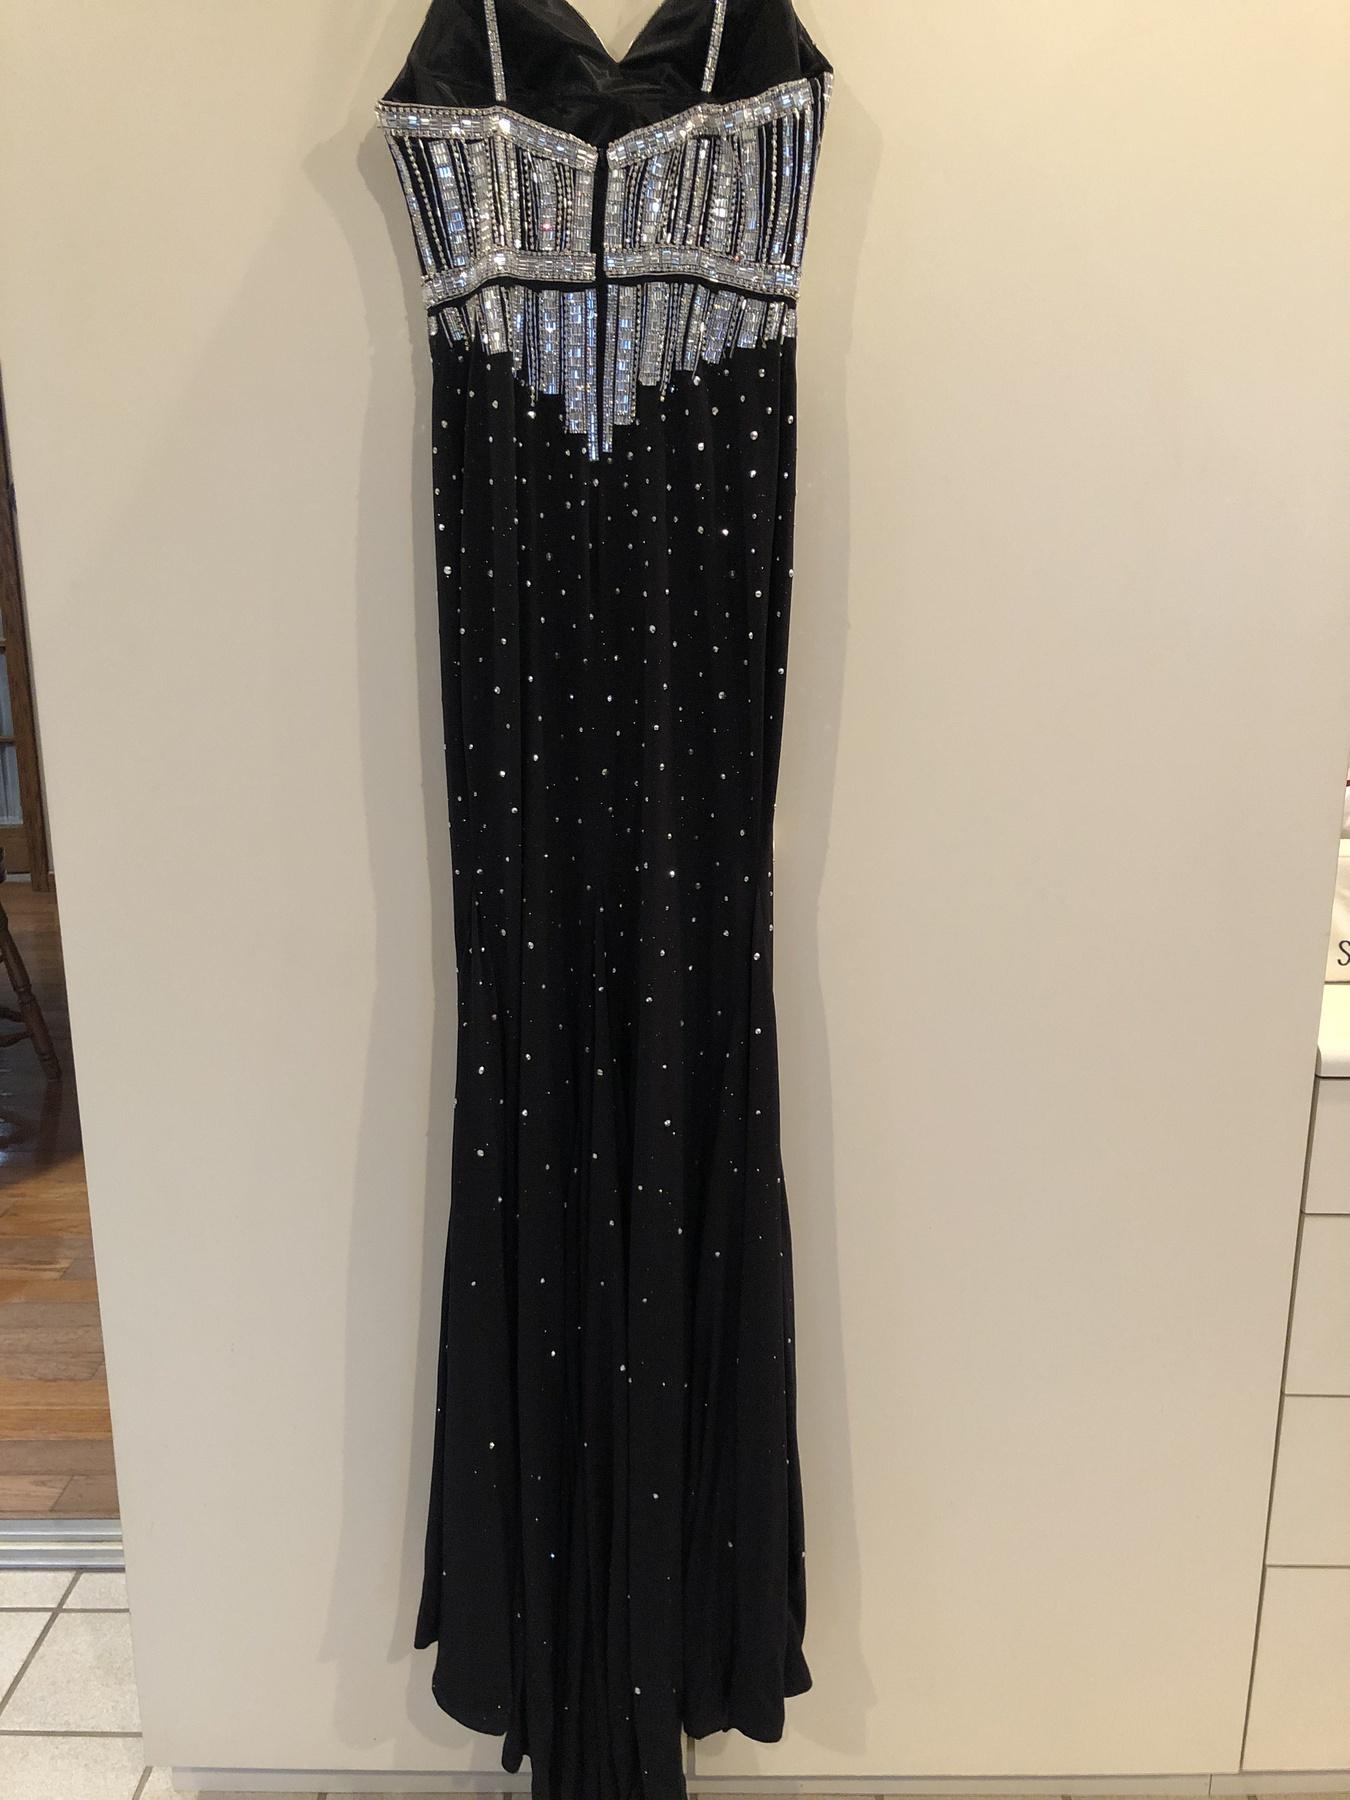 Johnathan Kayne Black Size 6 Shiny Jonathan Kayne A-line Dress on Queenly